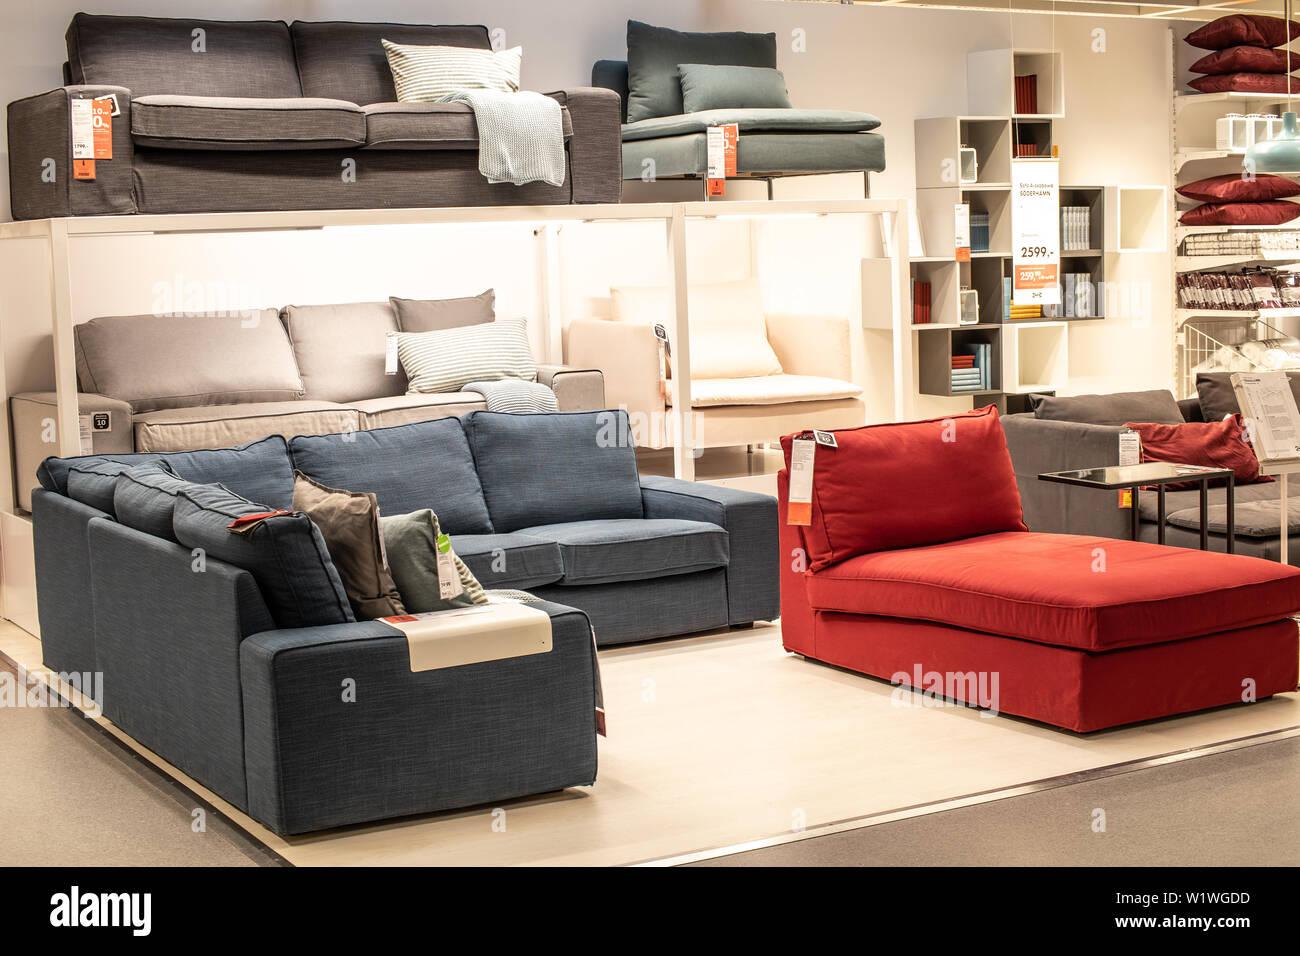 Outstanding Lodz Poland Jan 2019 Exhibition Interior Ikea Store Machost Co Dining Chair Design Ideas Machostcouk